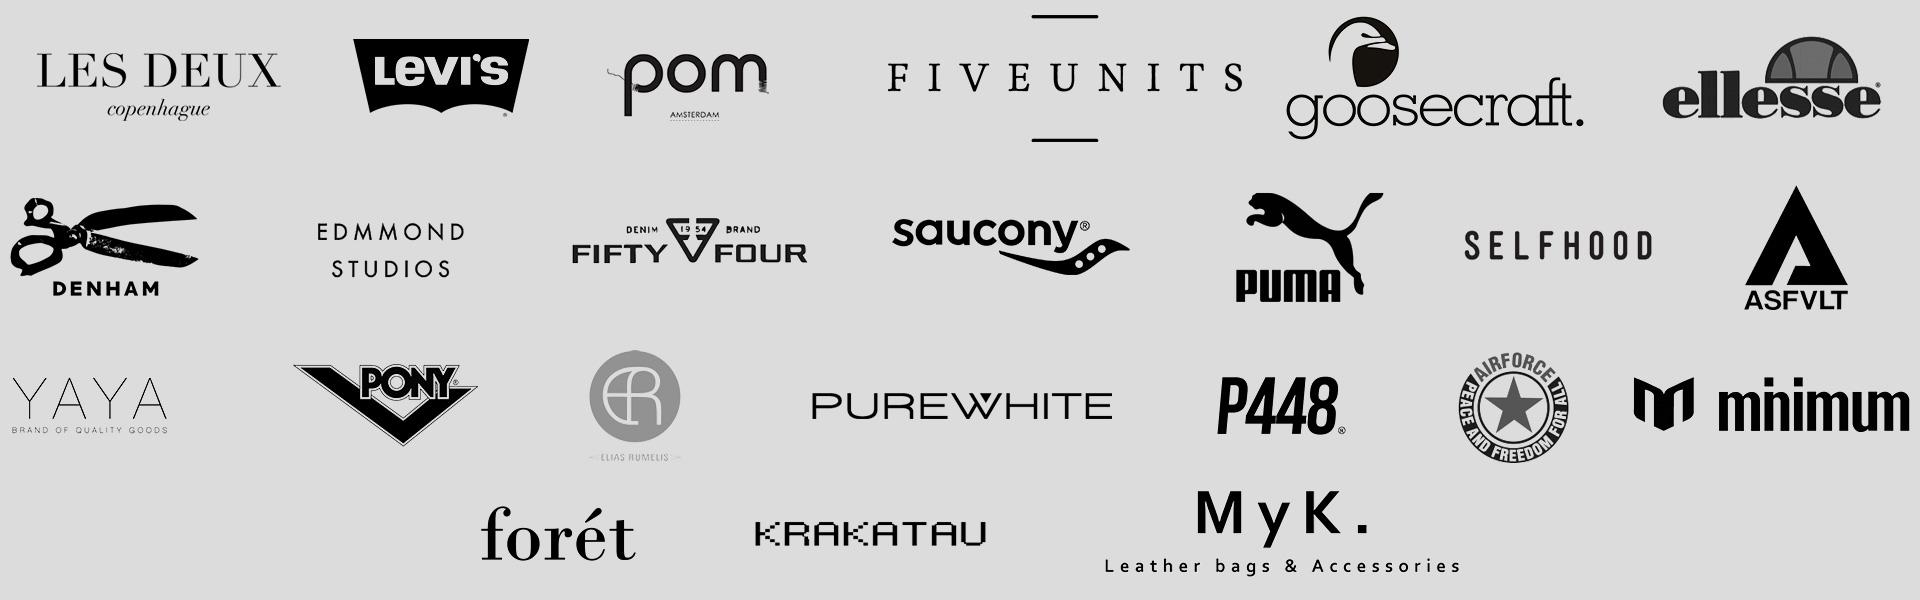 detempel-logos-2019-sep